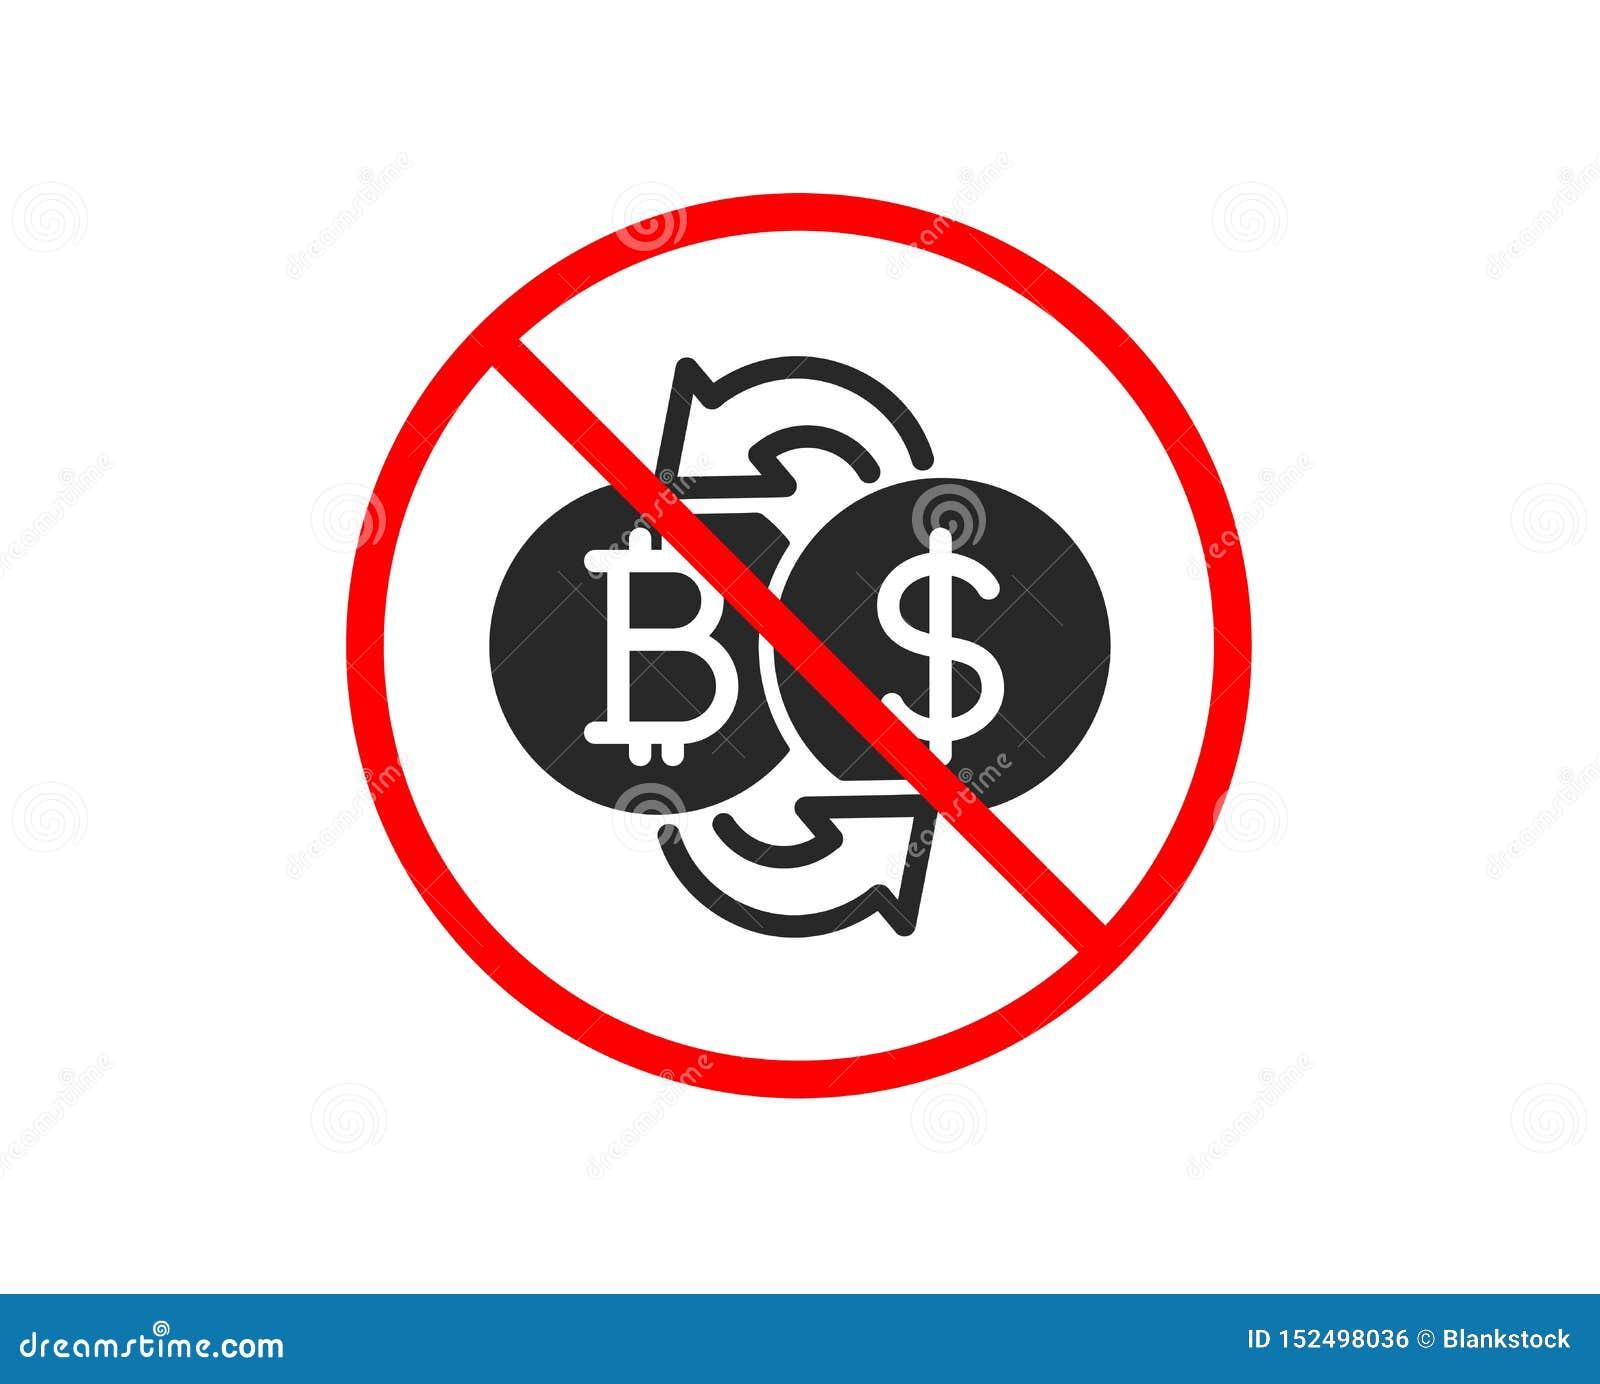 Cryptocurrency exchange icon